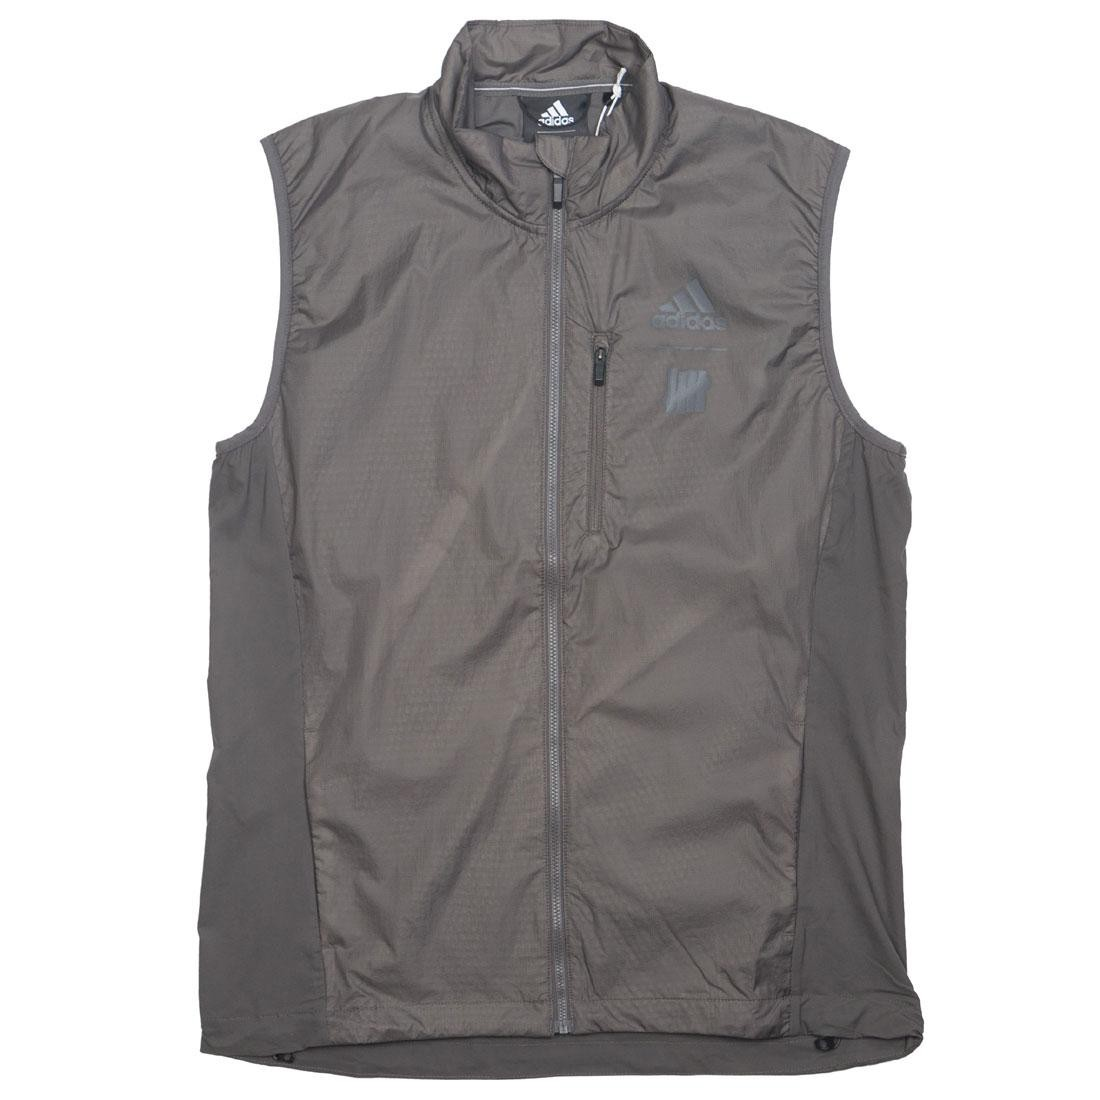 Adidas x Undefeated Men Running Vest (gray / cinder)